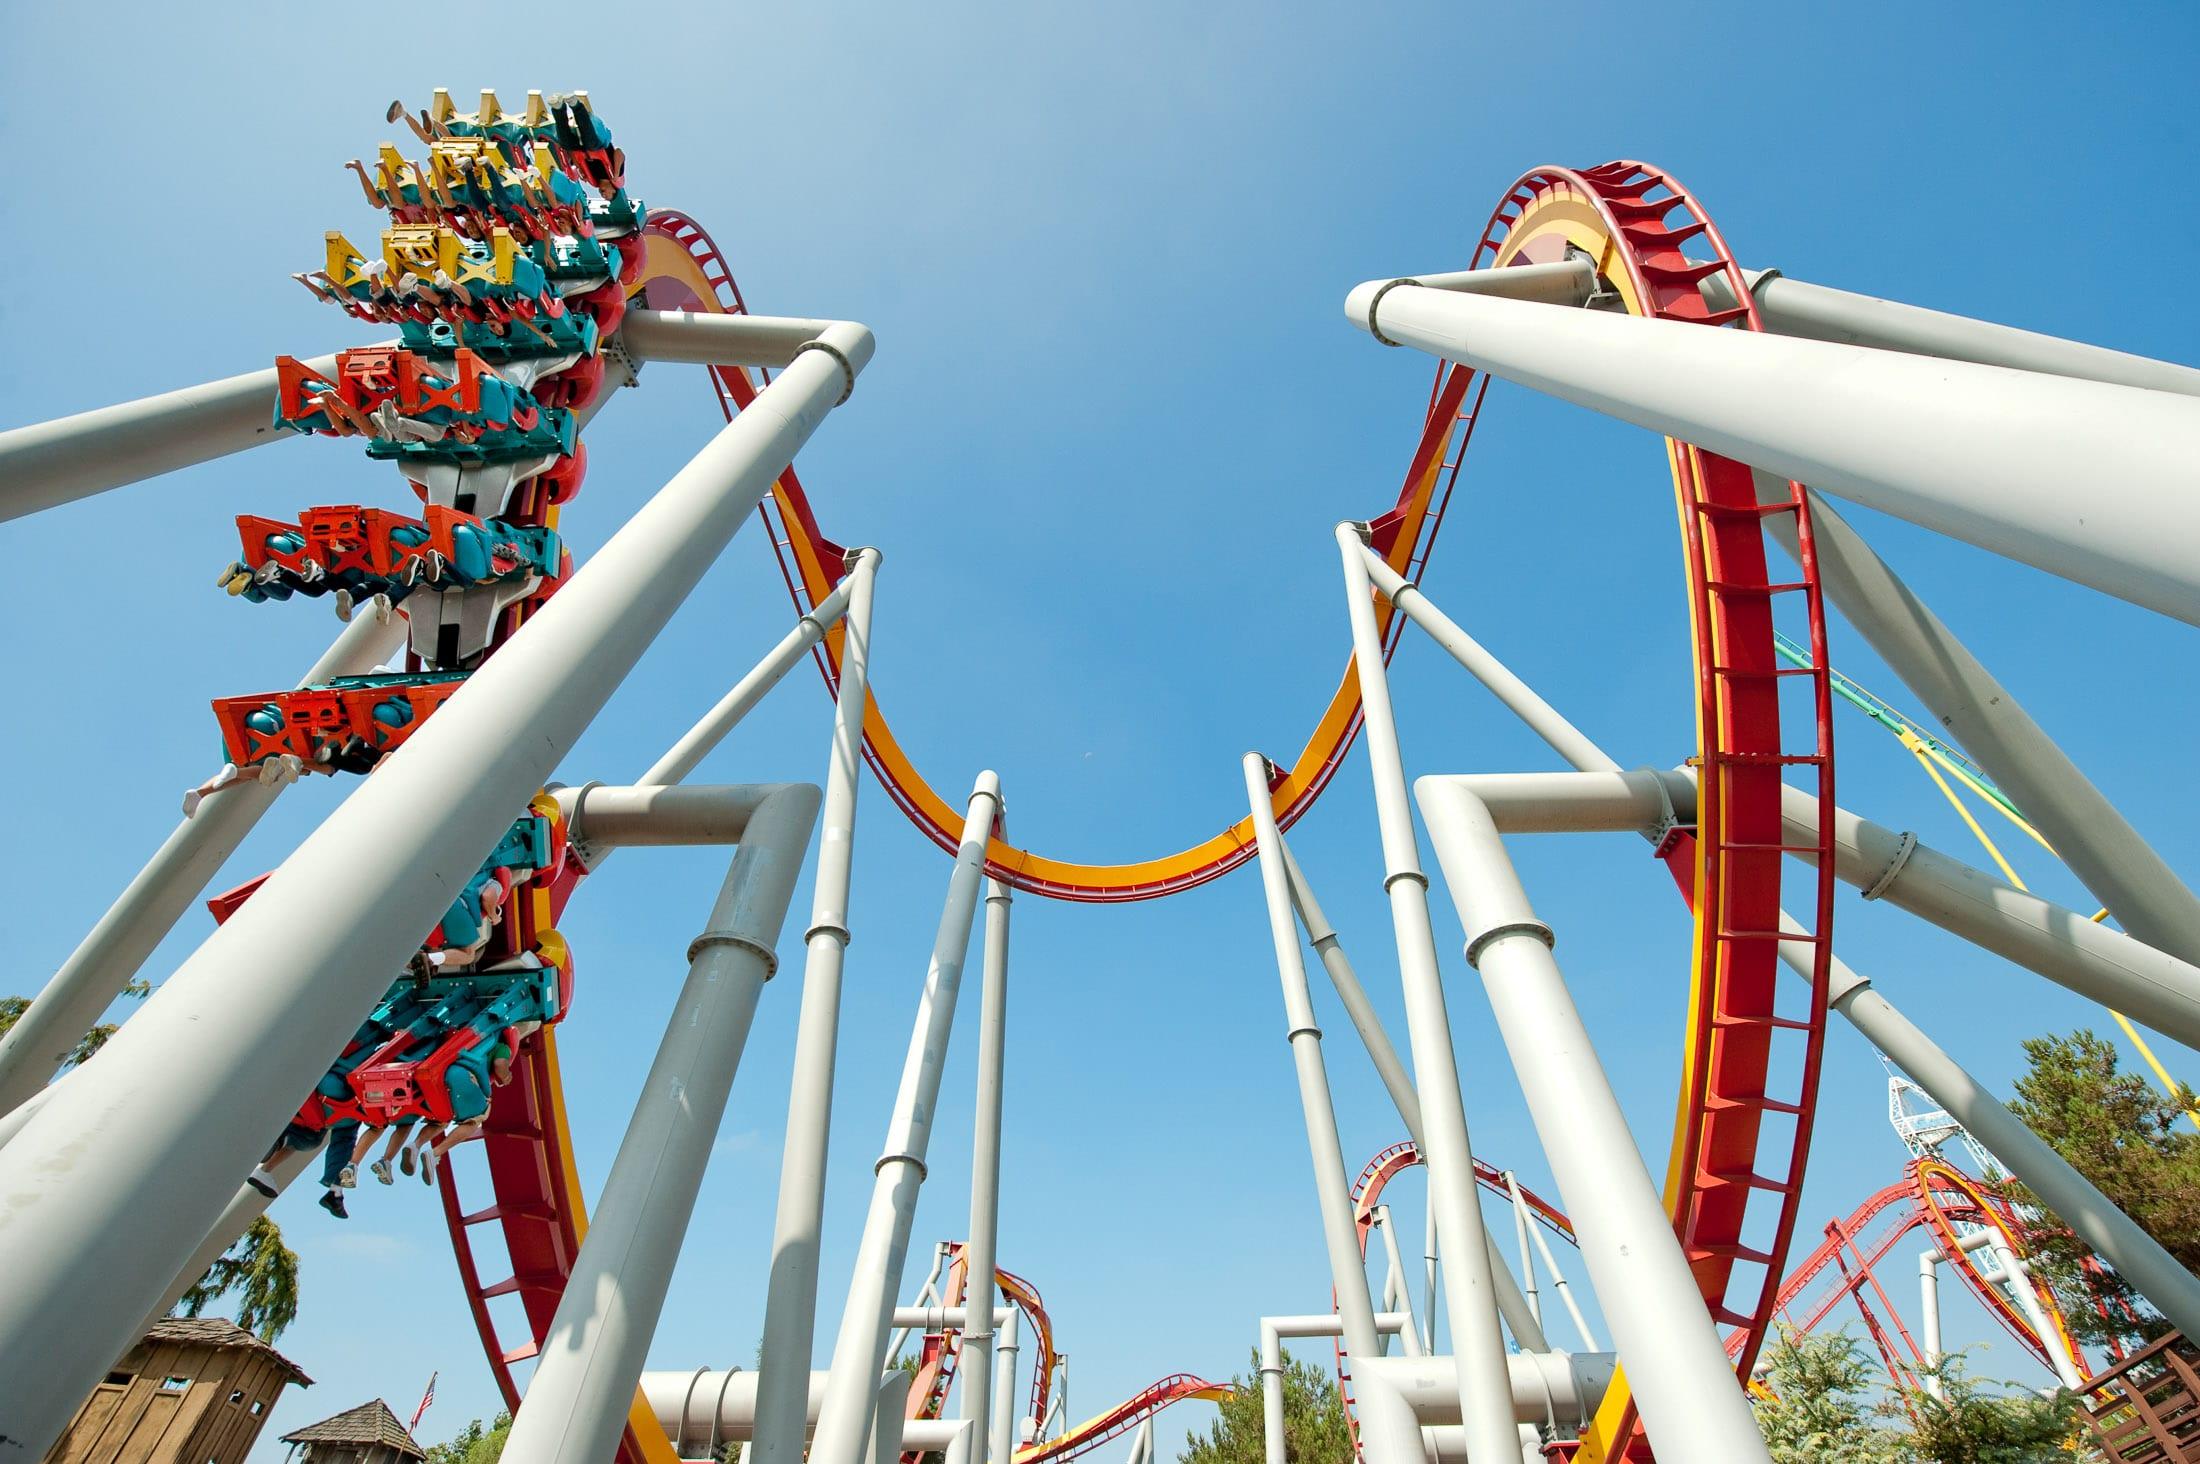 Roller coaster at Knott's Berry Farm.